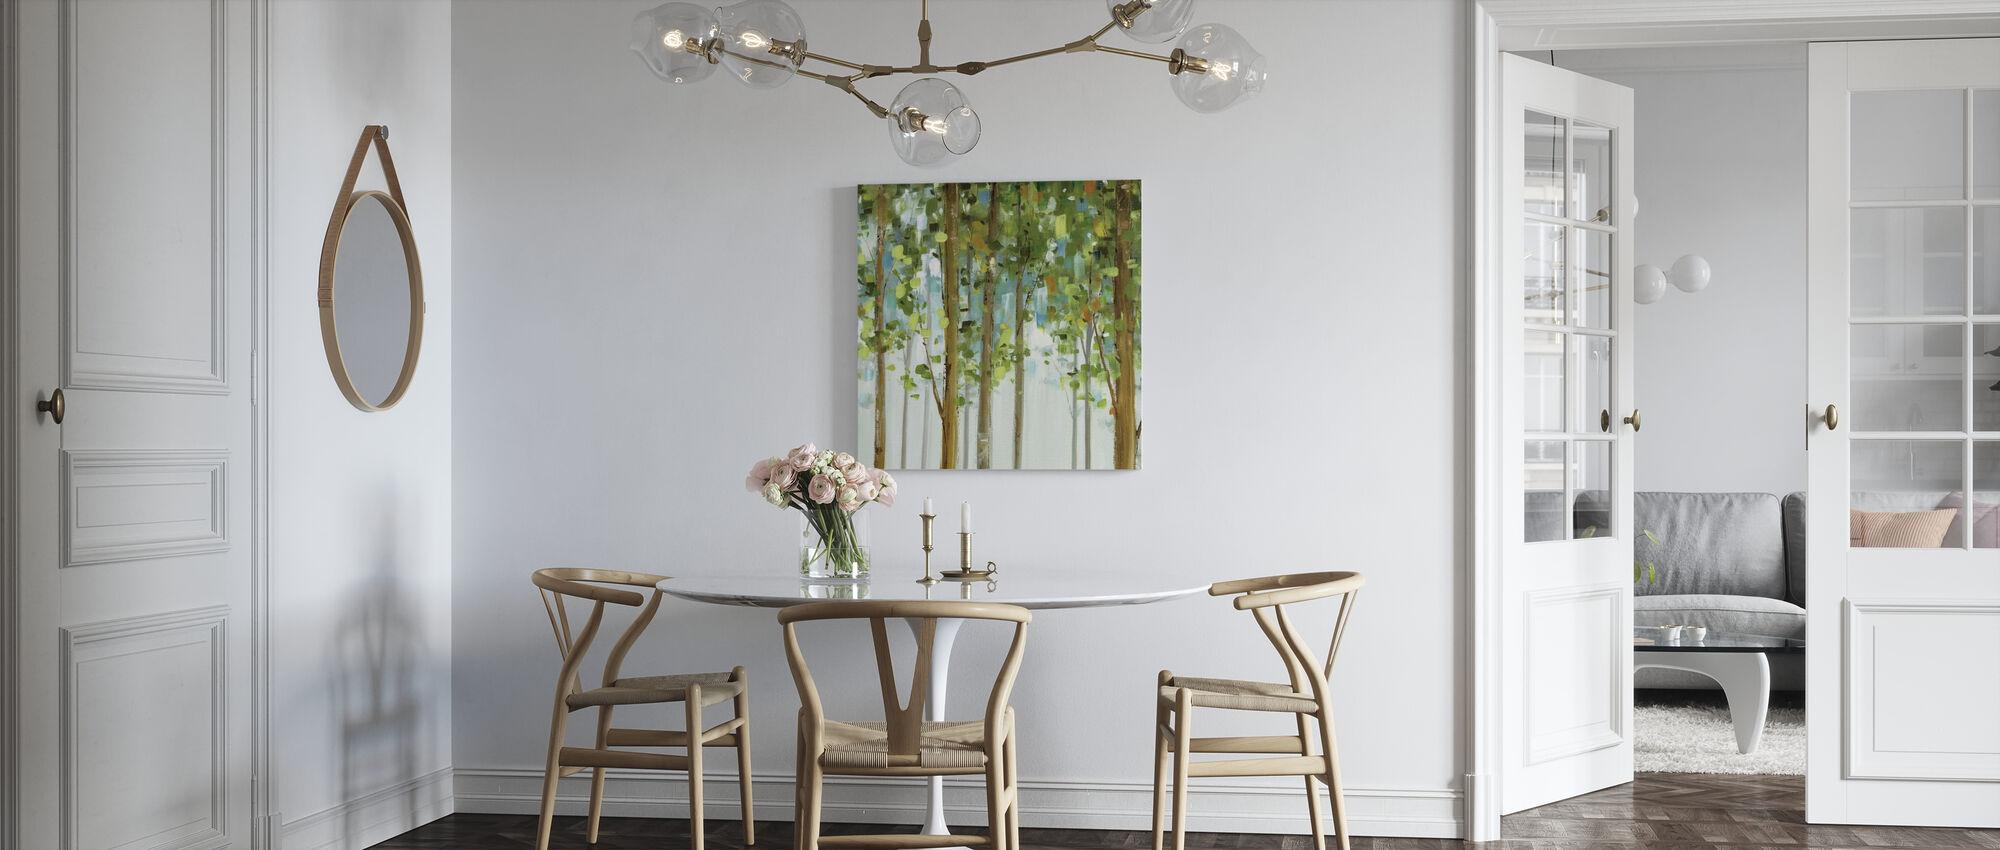 Studio Forestale - Stampa su tela - Cucina